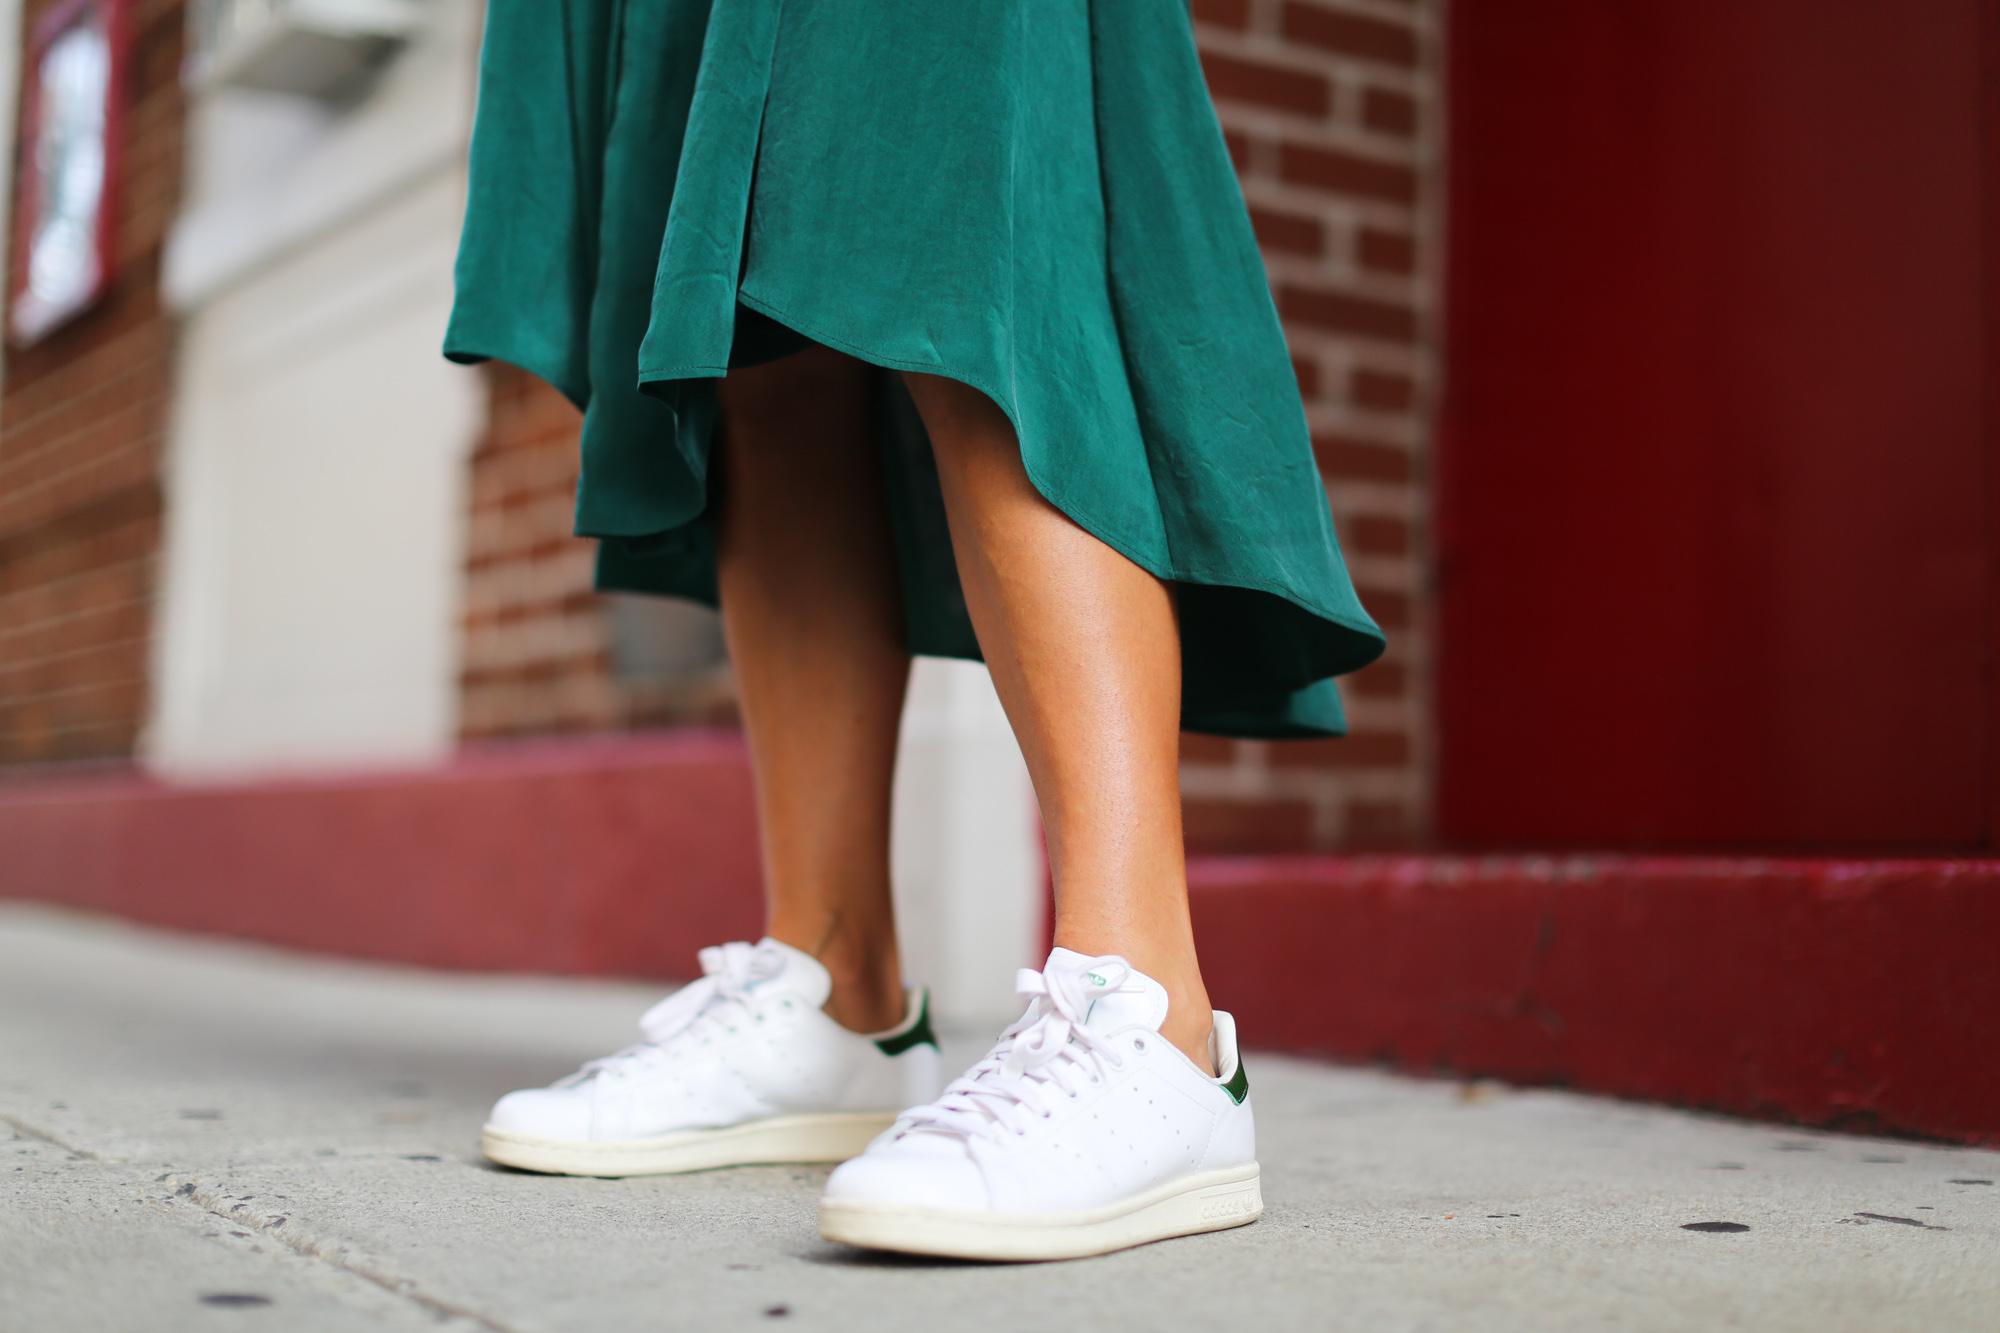 Clochet_streetstyle_newyork_h&m_trend_green_midi_skirt_adidas_stansmith-9